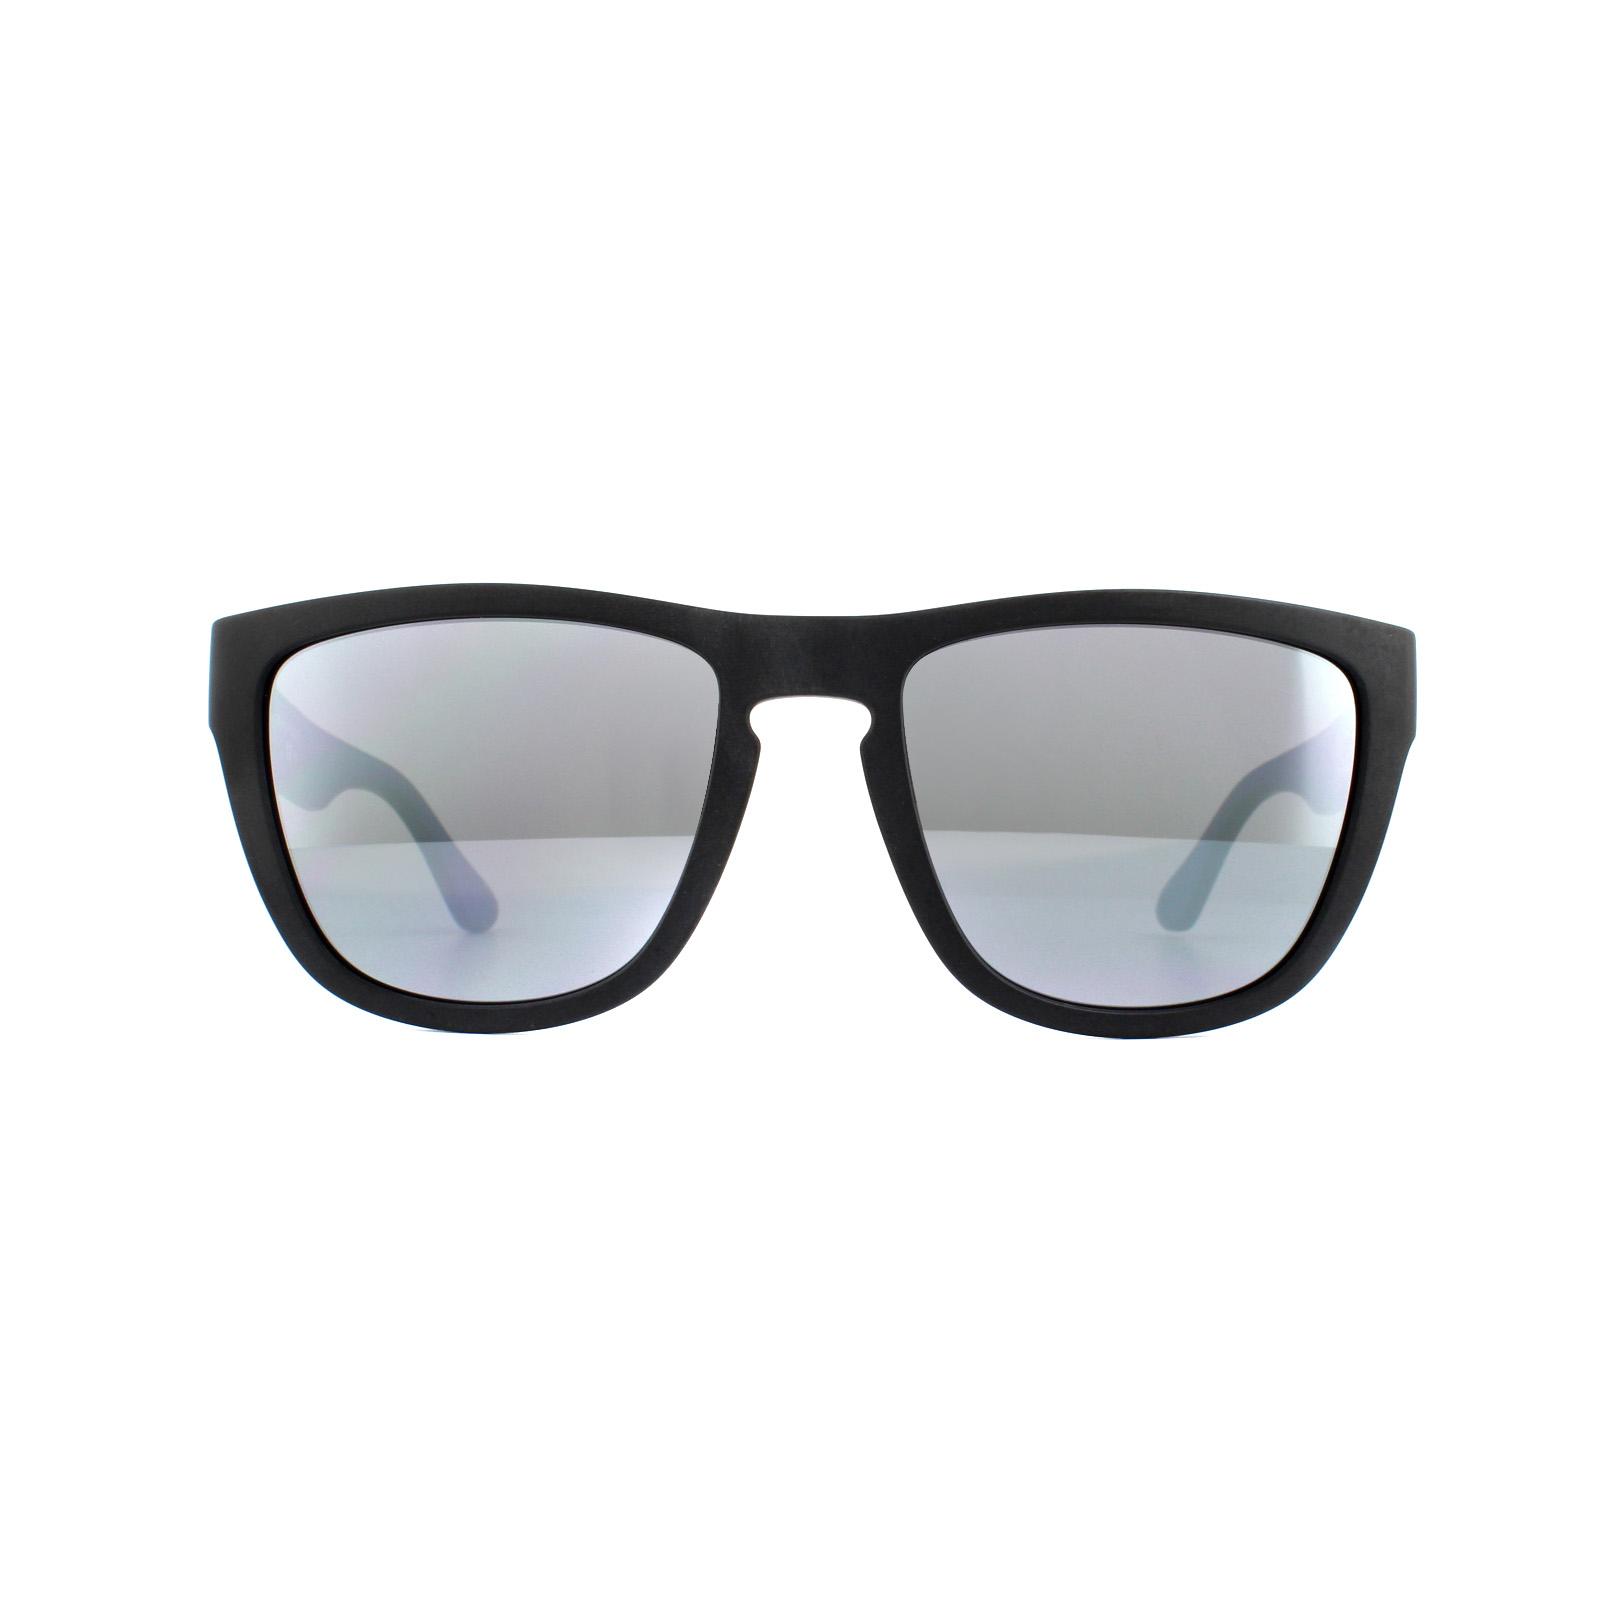 f96ef64c Sentinel Tommy Hilfiger Sunglasses TH 1557/S 003 T4 Matte Black Black Grey  Mirror